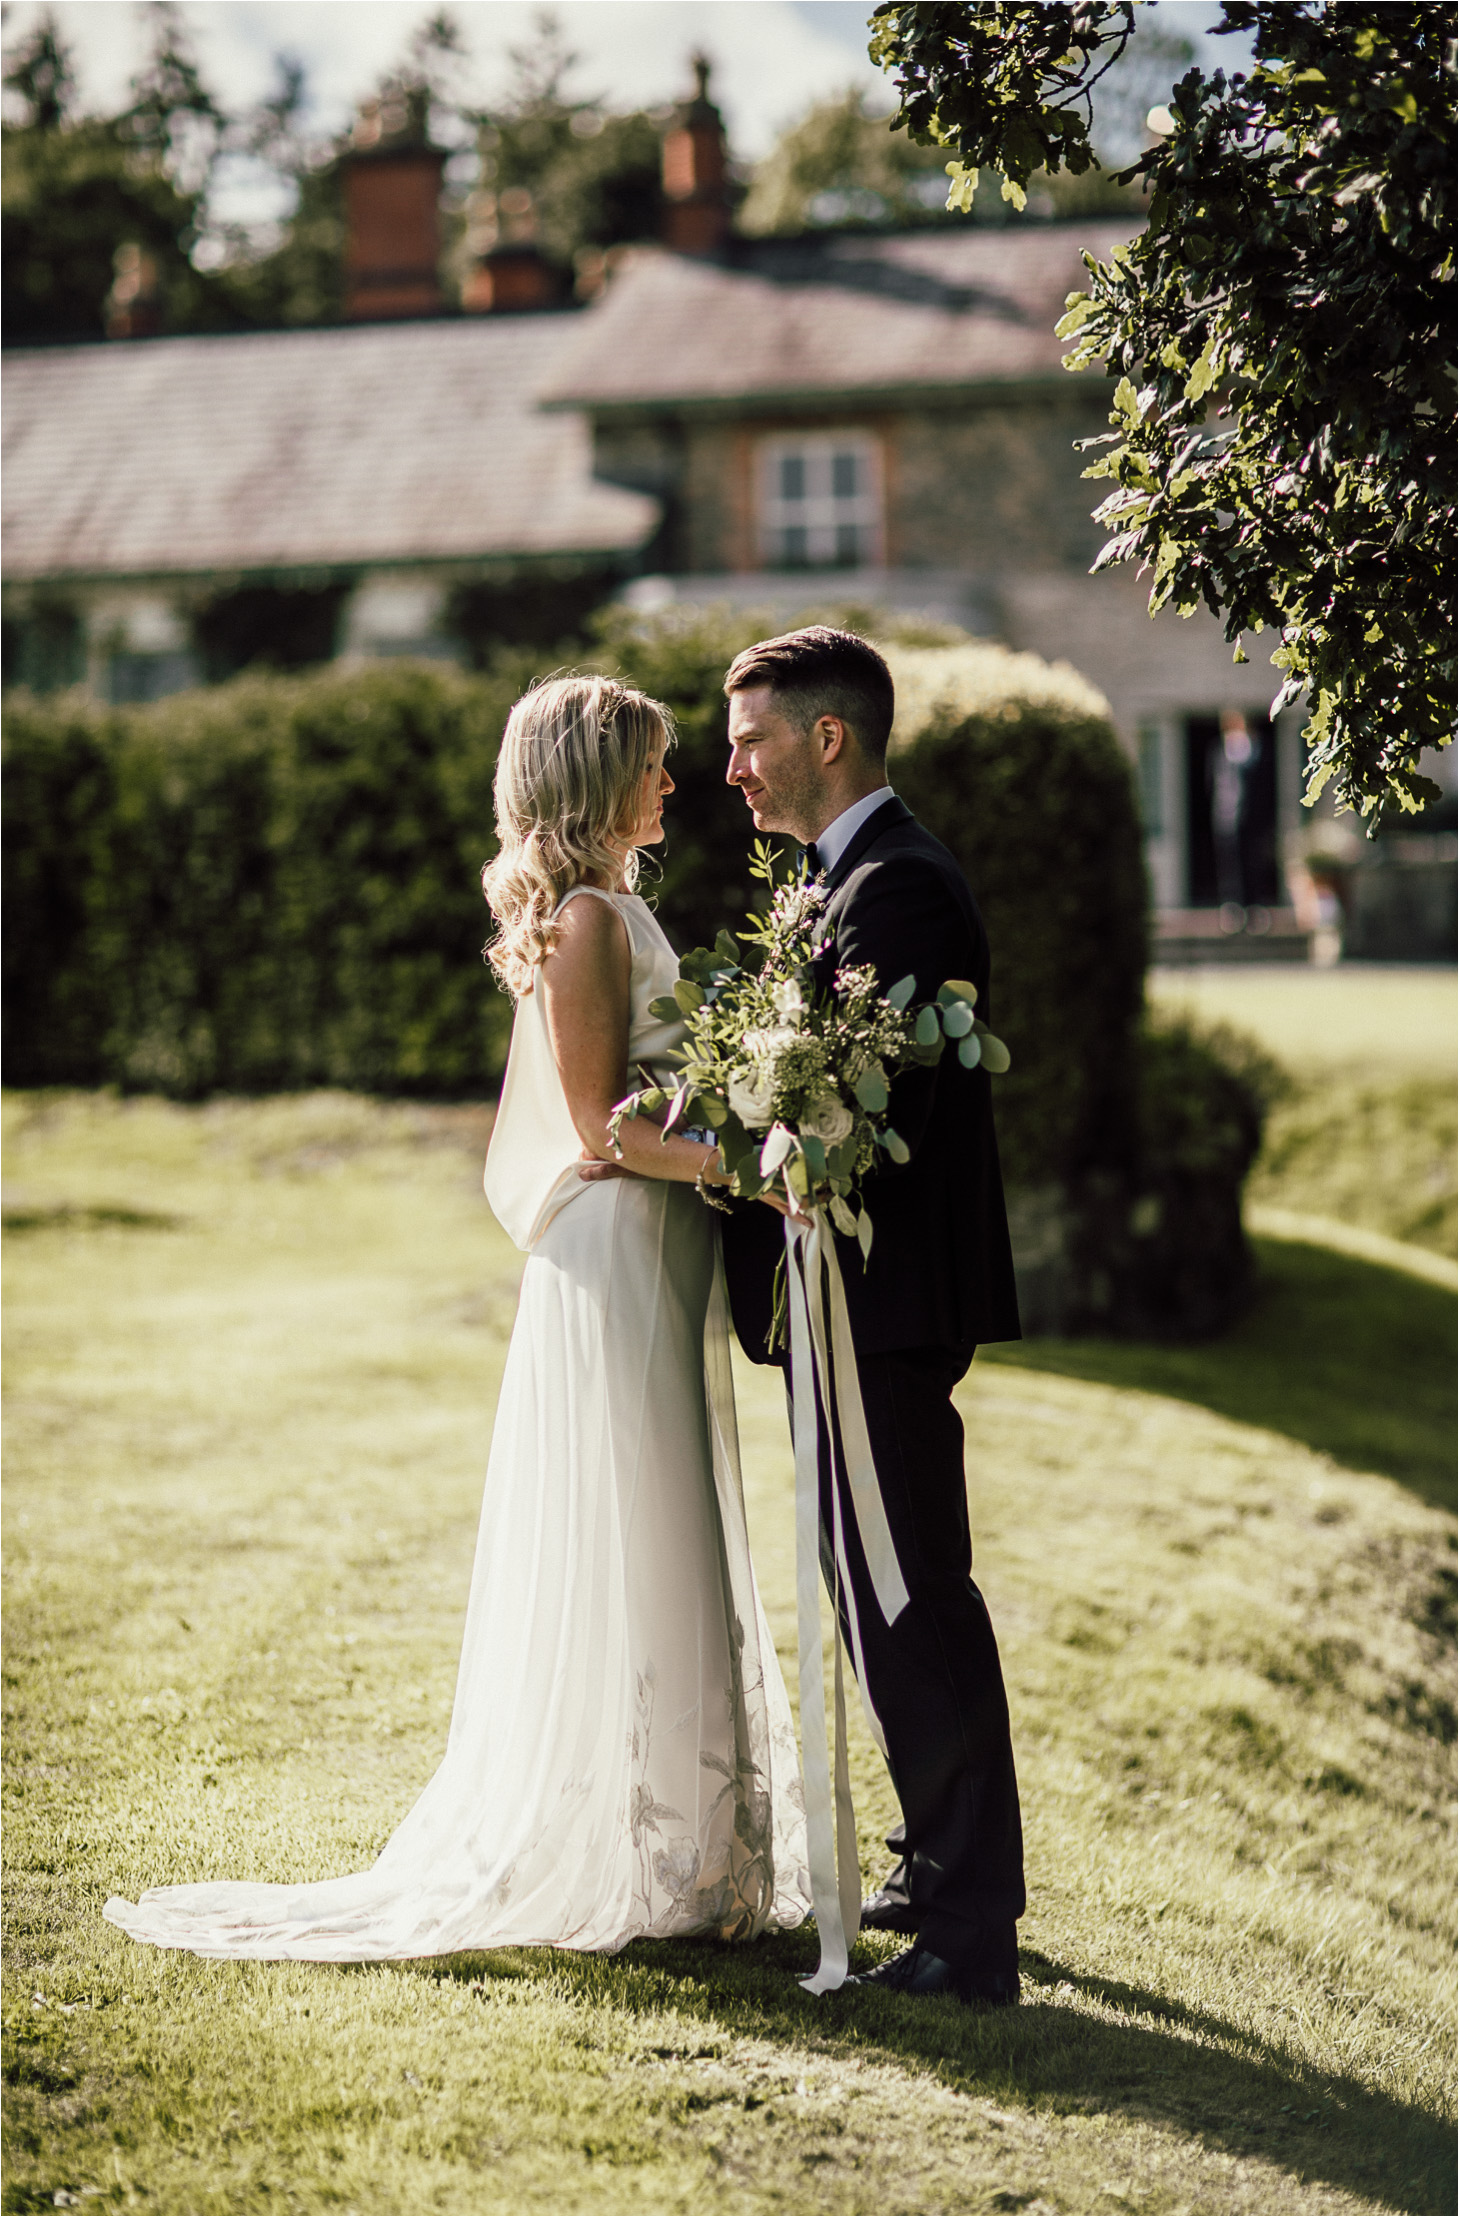 Virgina Lodge Photography. darren fitzpatrick. Wedding.16